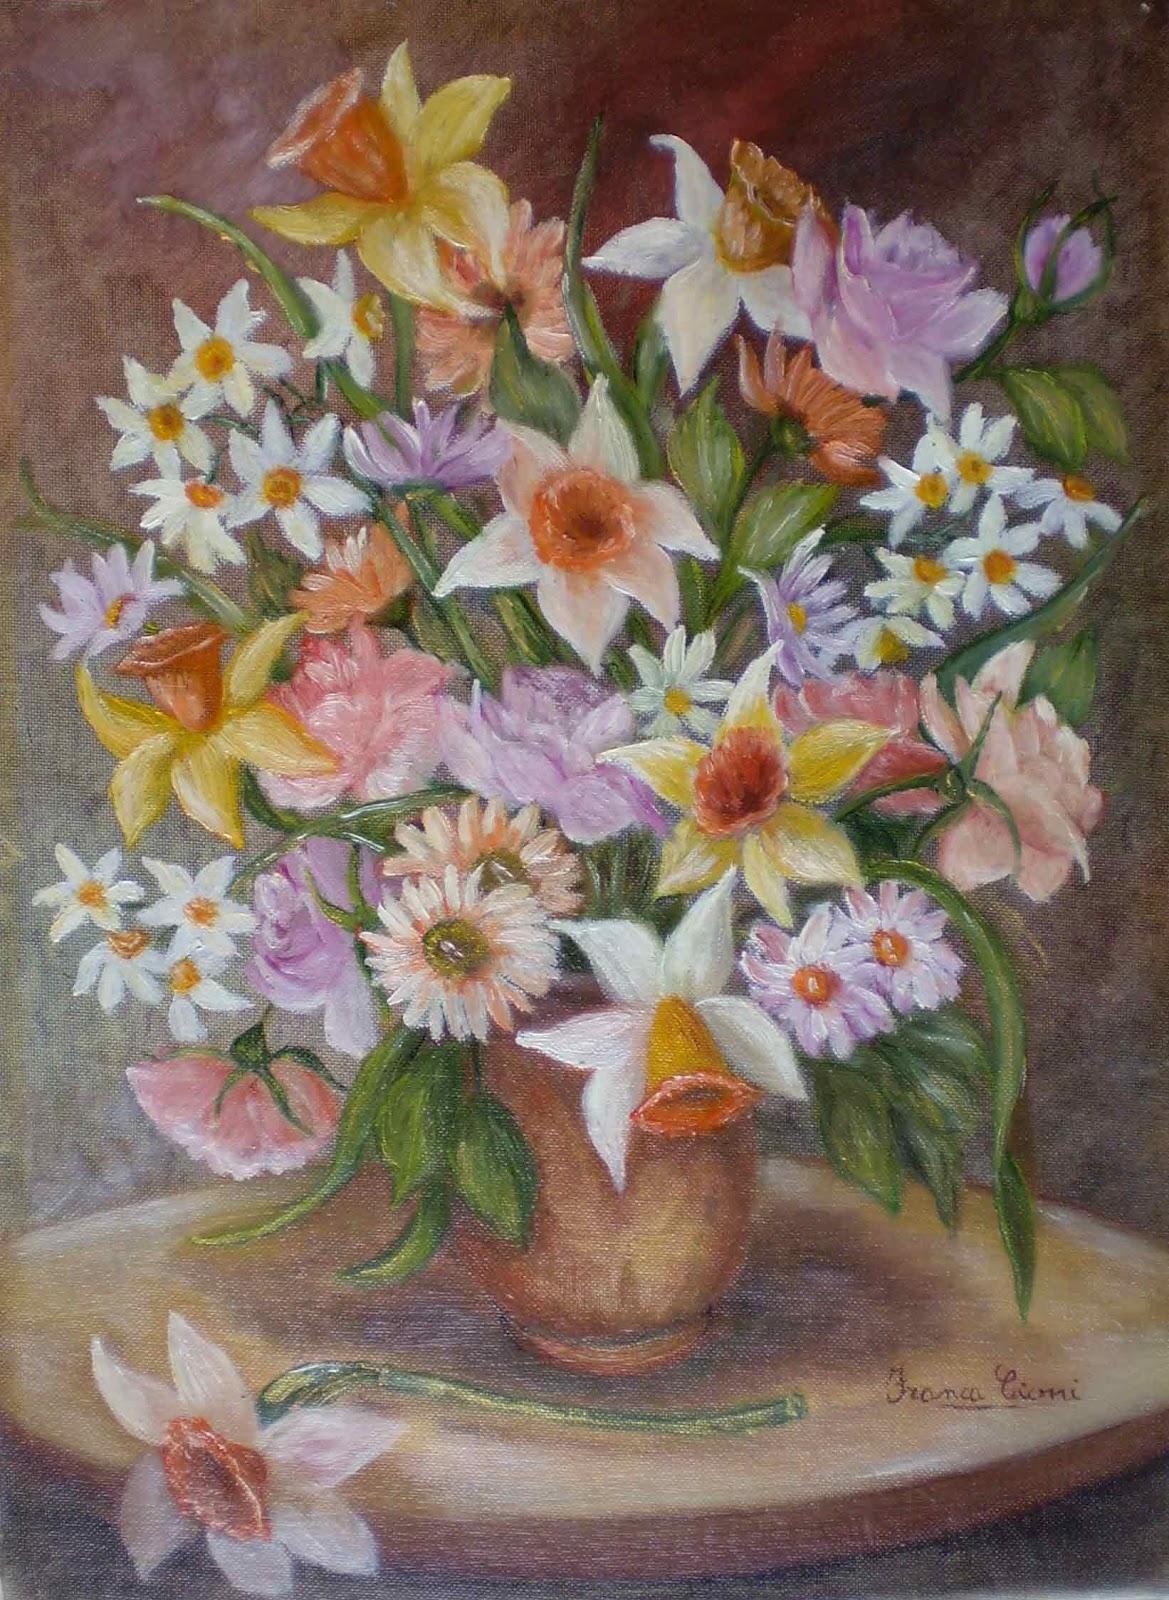 Franca cioni dipinti e poesie fiori primaverili - Fiori primaverili ...